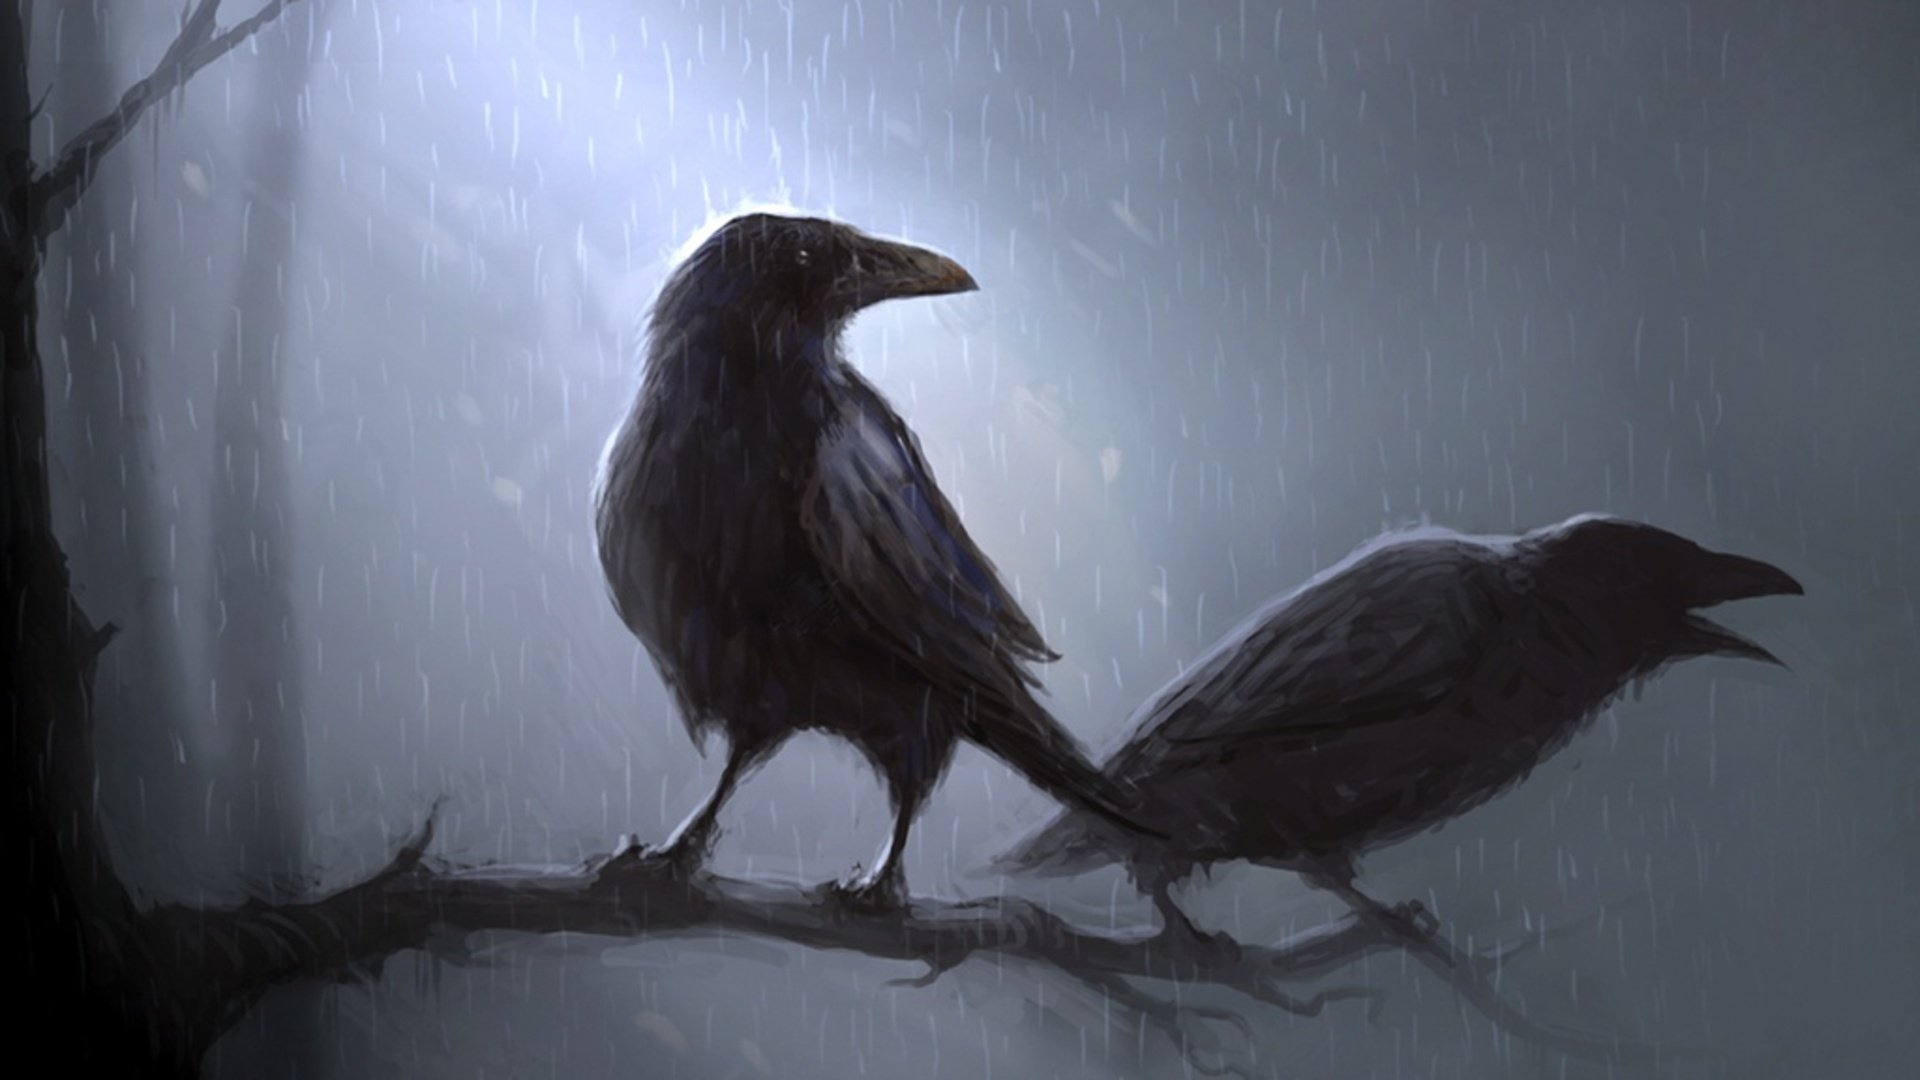 Animal - Crow  Raven Animal Bird Wallpaper